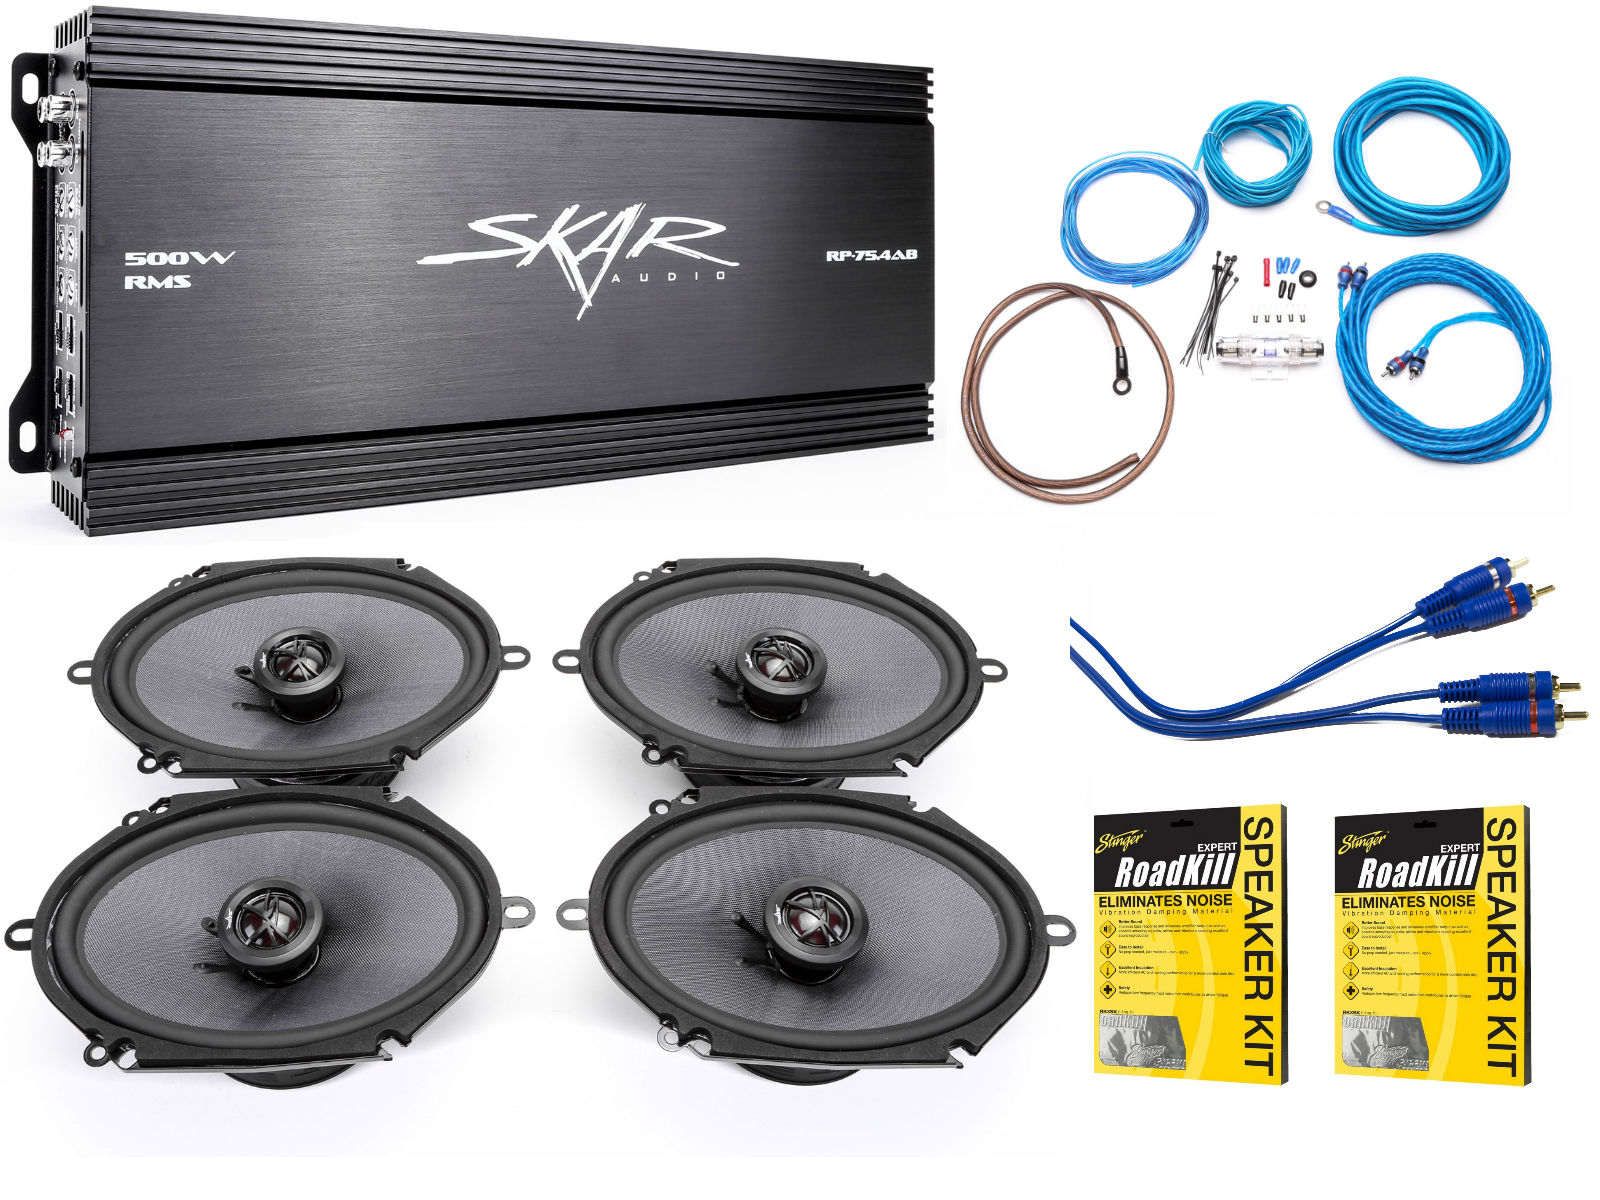 medium resolution of skar audio 6 x8 complete elite speaker upgrade package with skar audio setup skar audio wiring